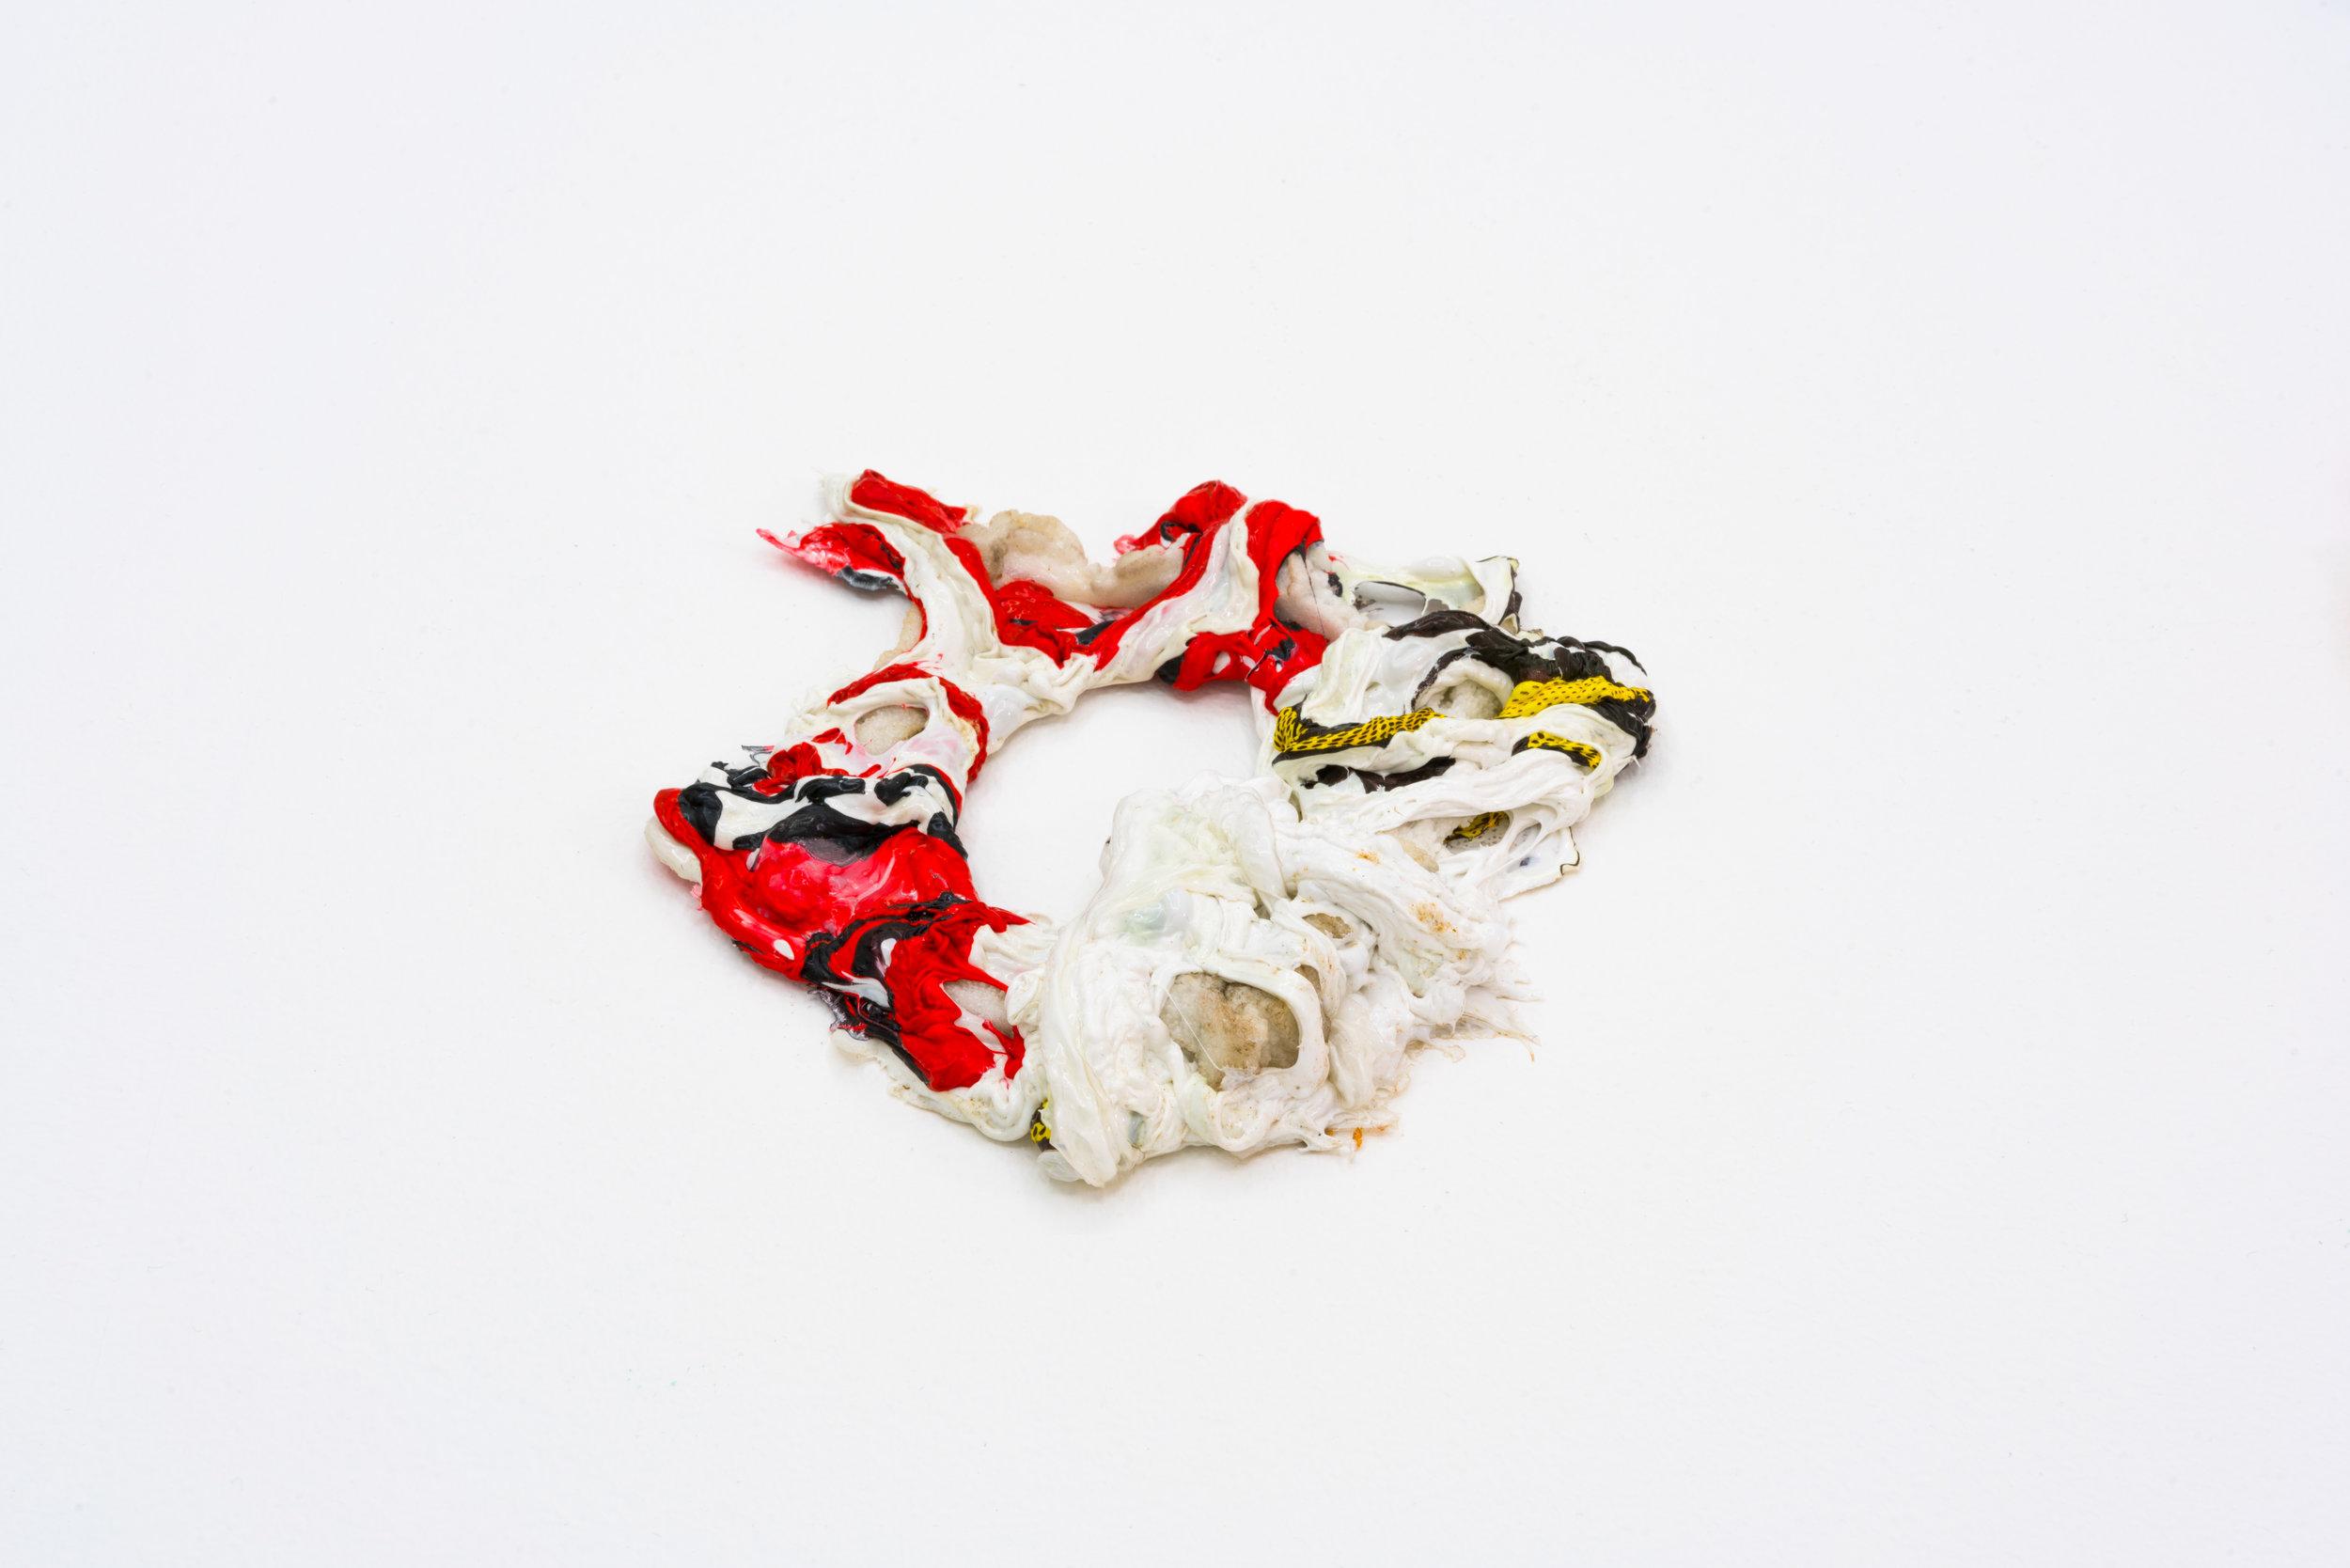 Remko Scha,  Plastic Meltdown , 1962-1992, Plastic, 2 x 14 x 14 cm